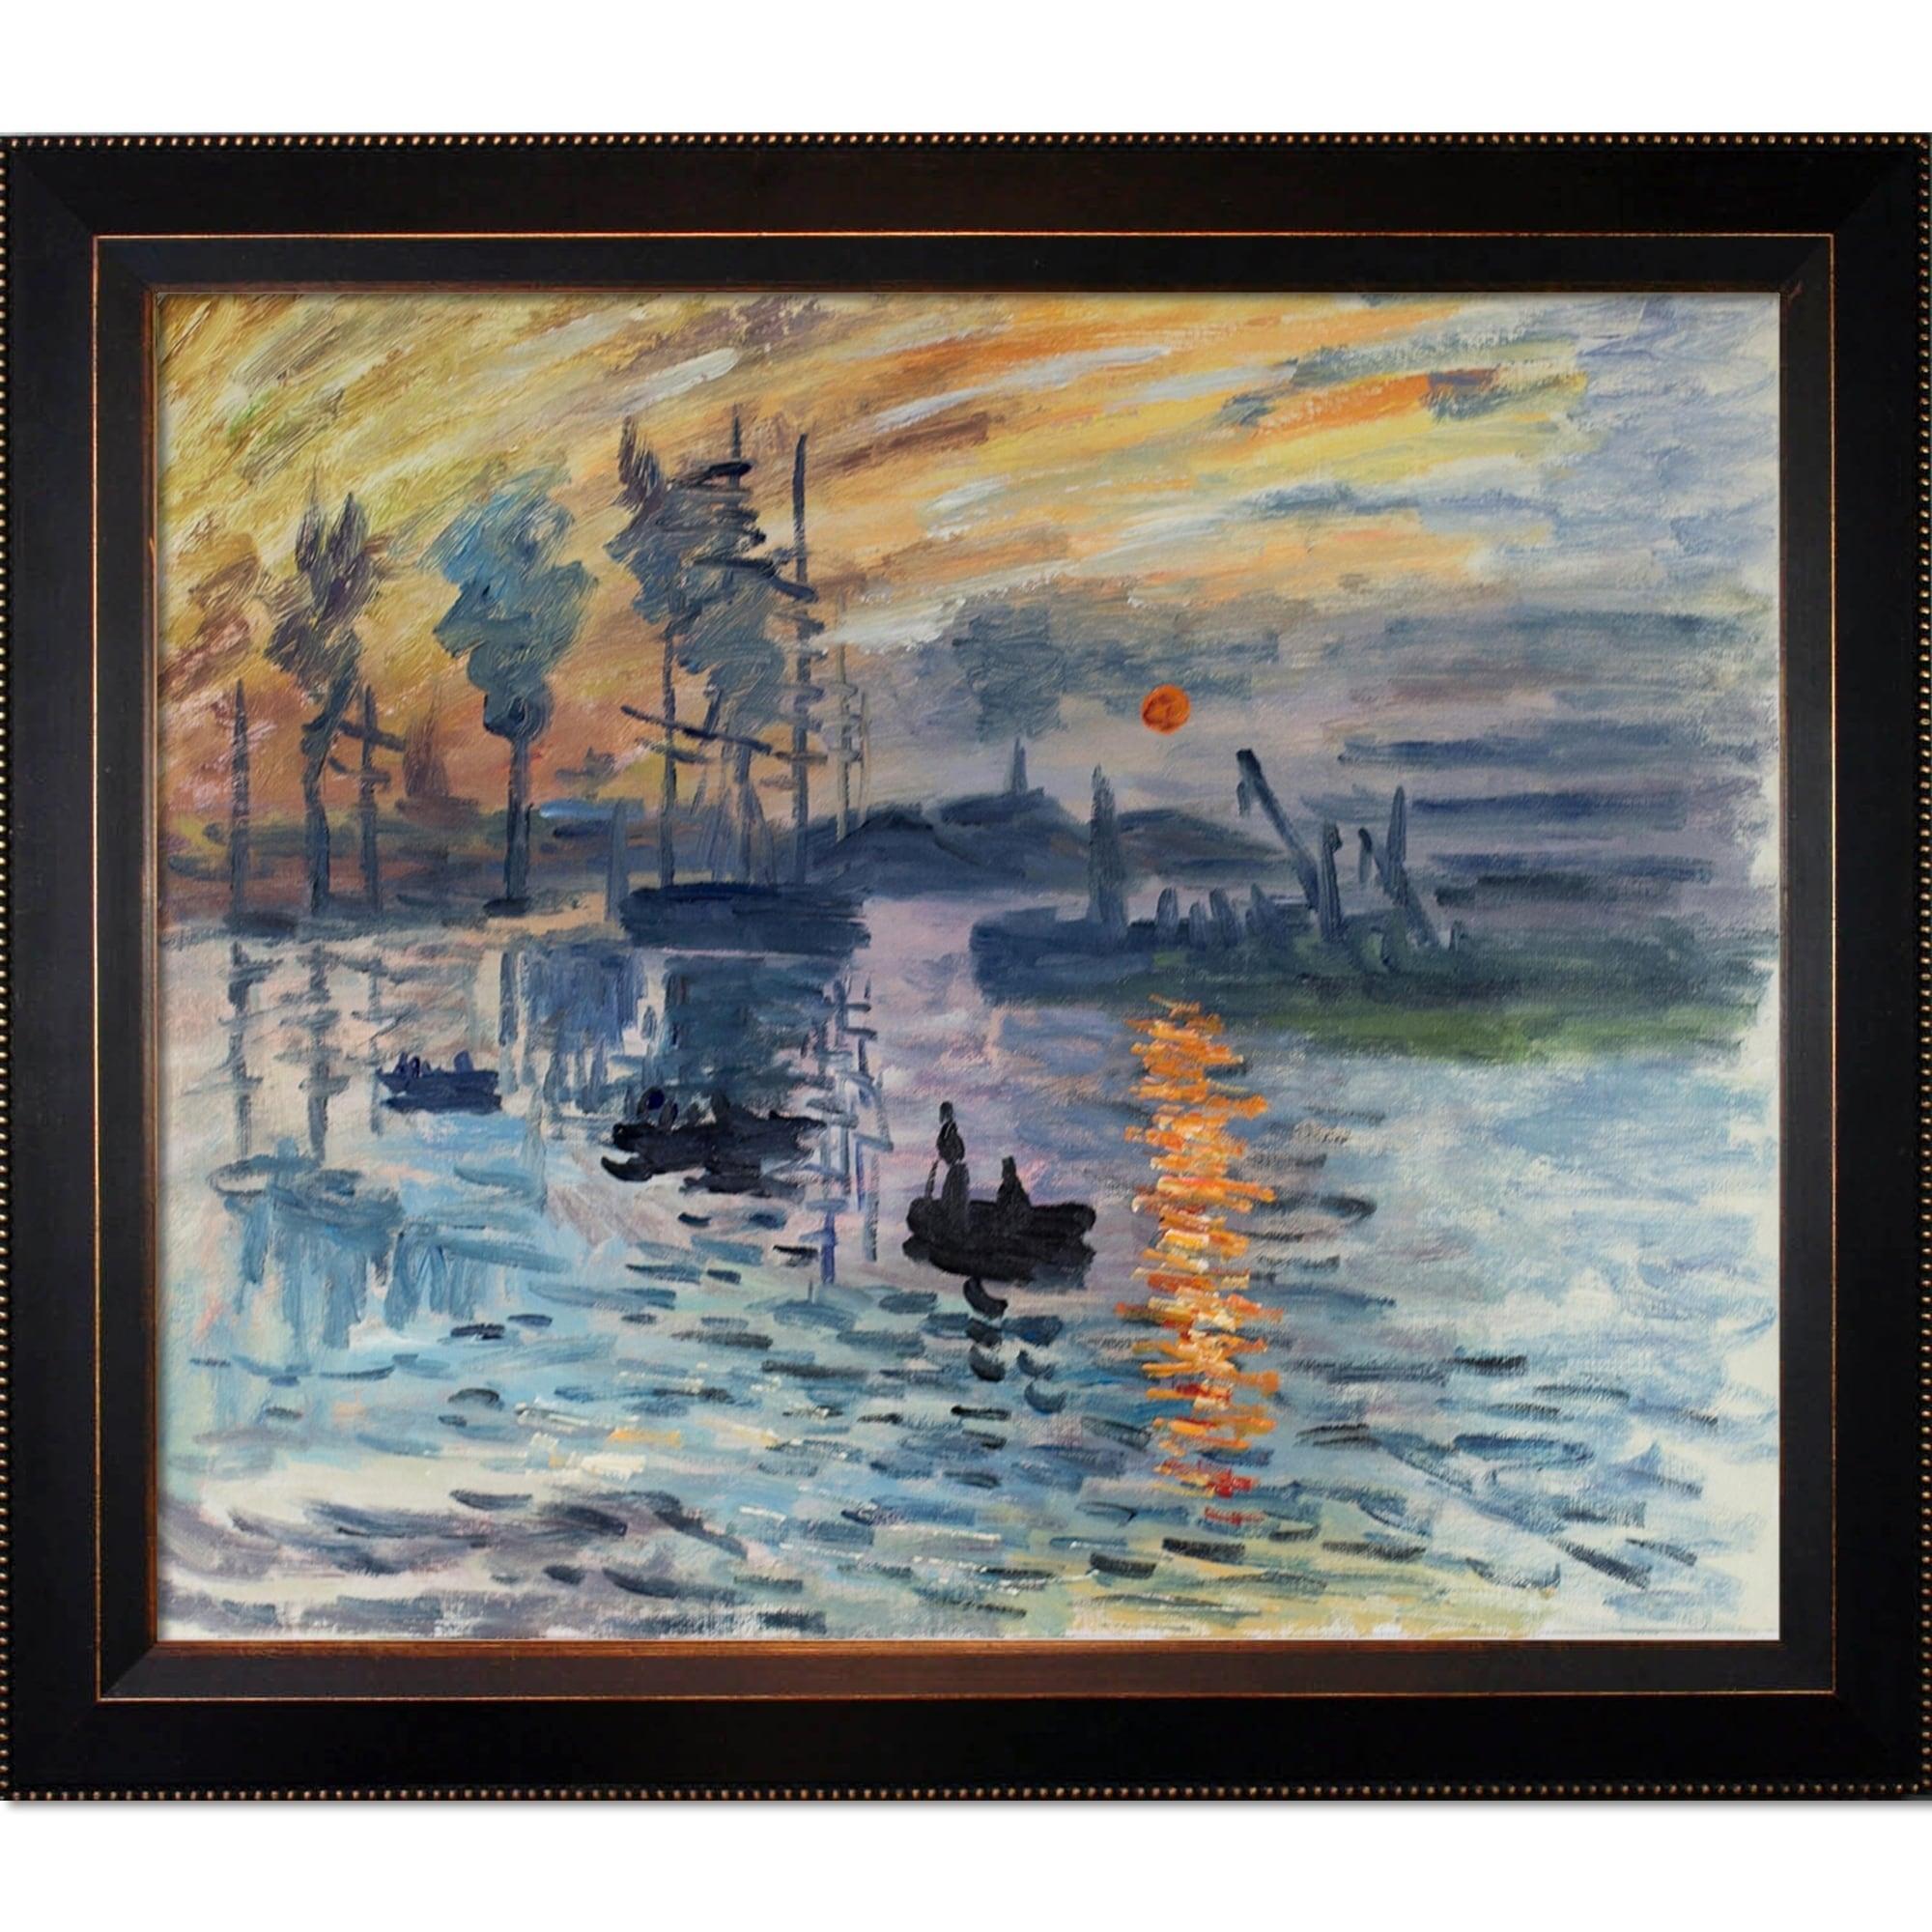 Claude Monet Impression Sunrise Hand Painted Framed Canvas Art Overstock 9207780